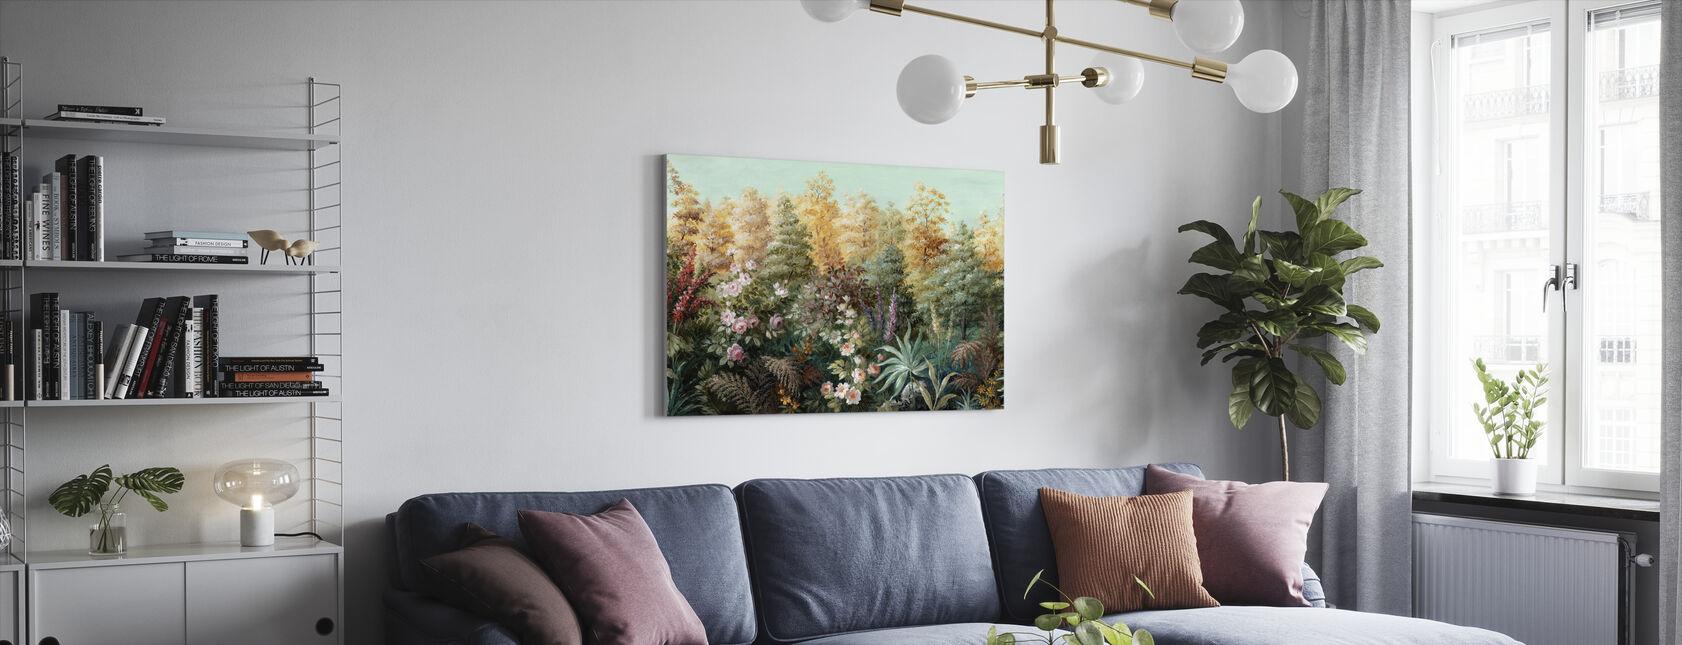 Underlandet Potpurri - Canvastavla - Vardagsrum